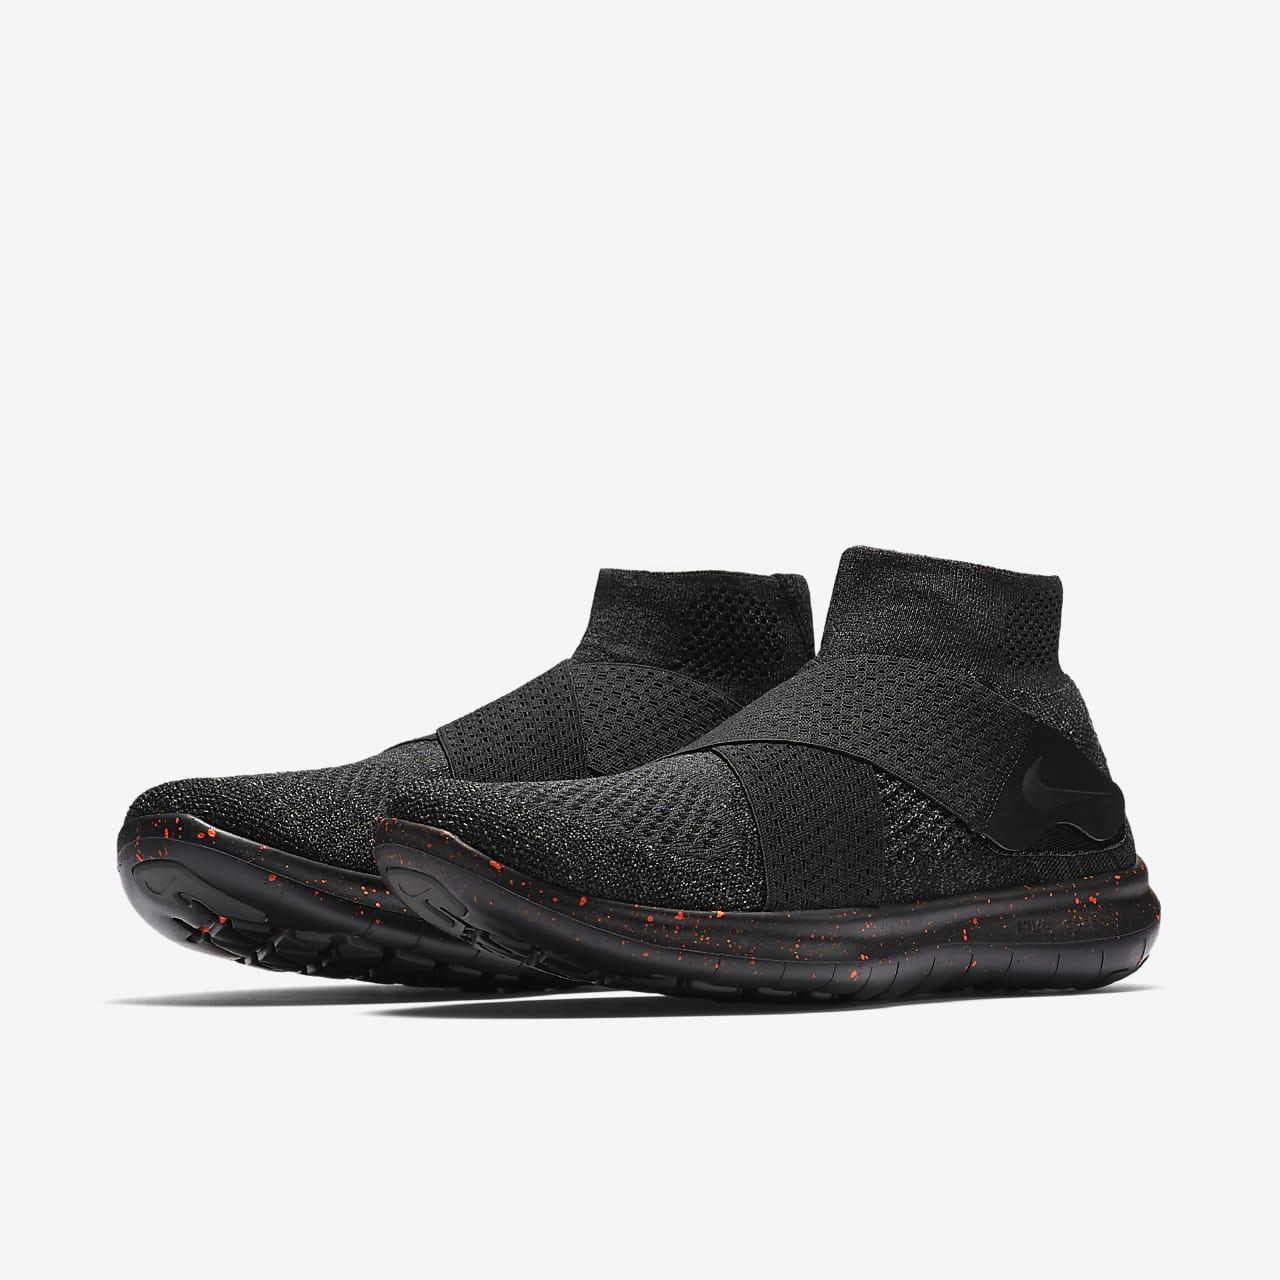 Ajustamiento sitio amplio  NikeLab Free RN Motion Flyknit 2017 Men's Running Shoe. Nike IN